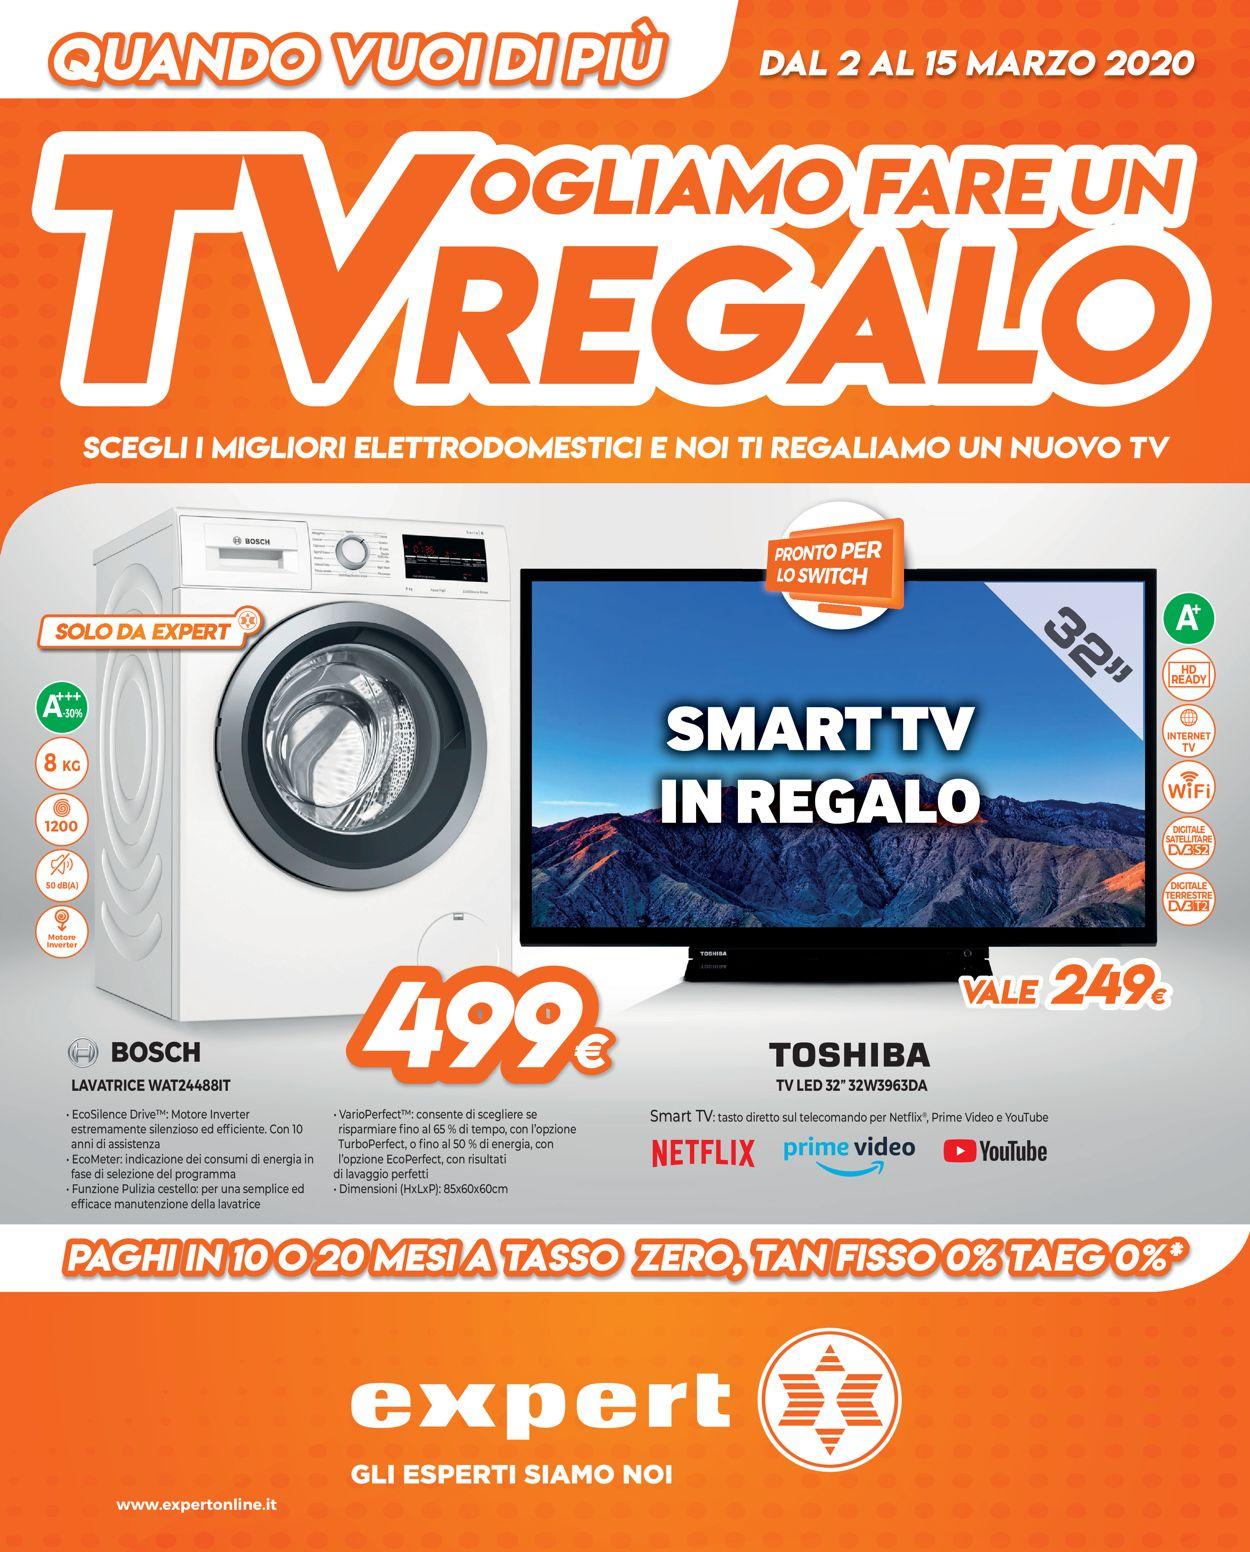 Volantino Iperal - Offerte 02/03-15/03/2020